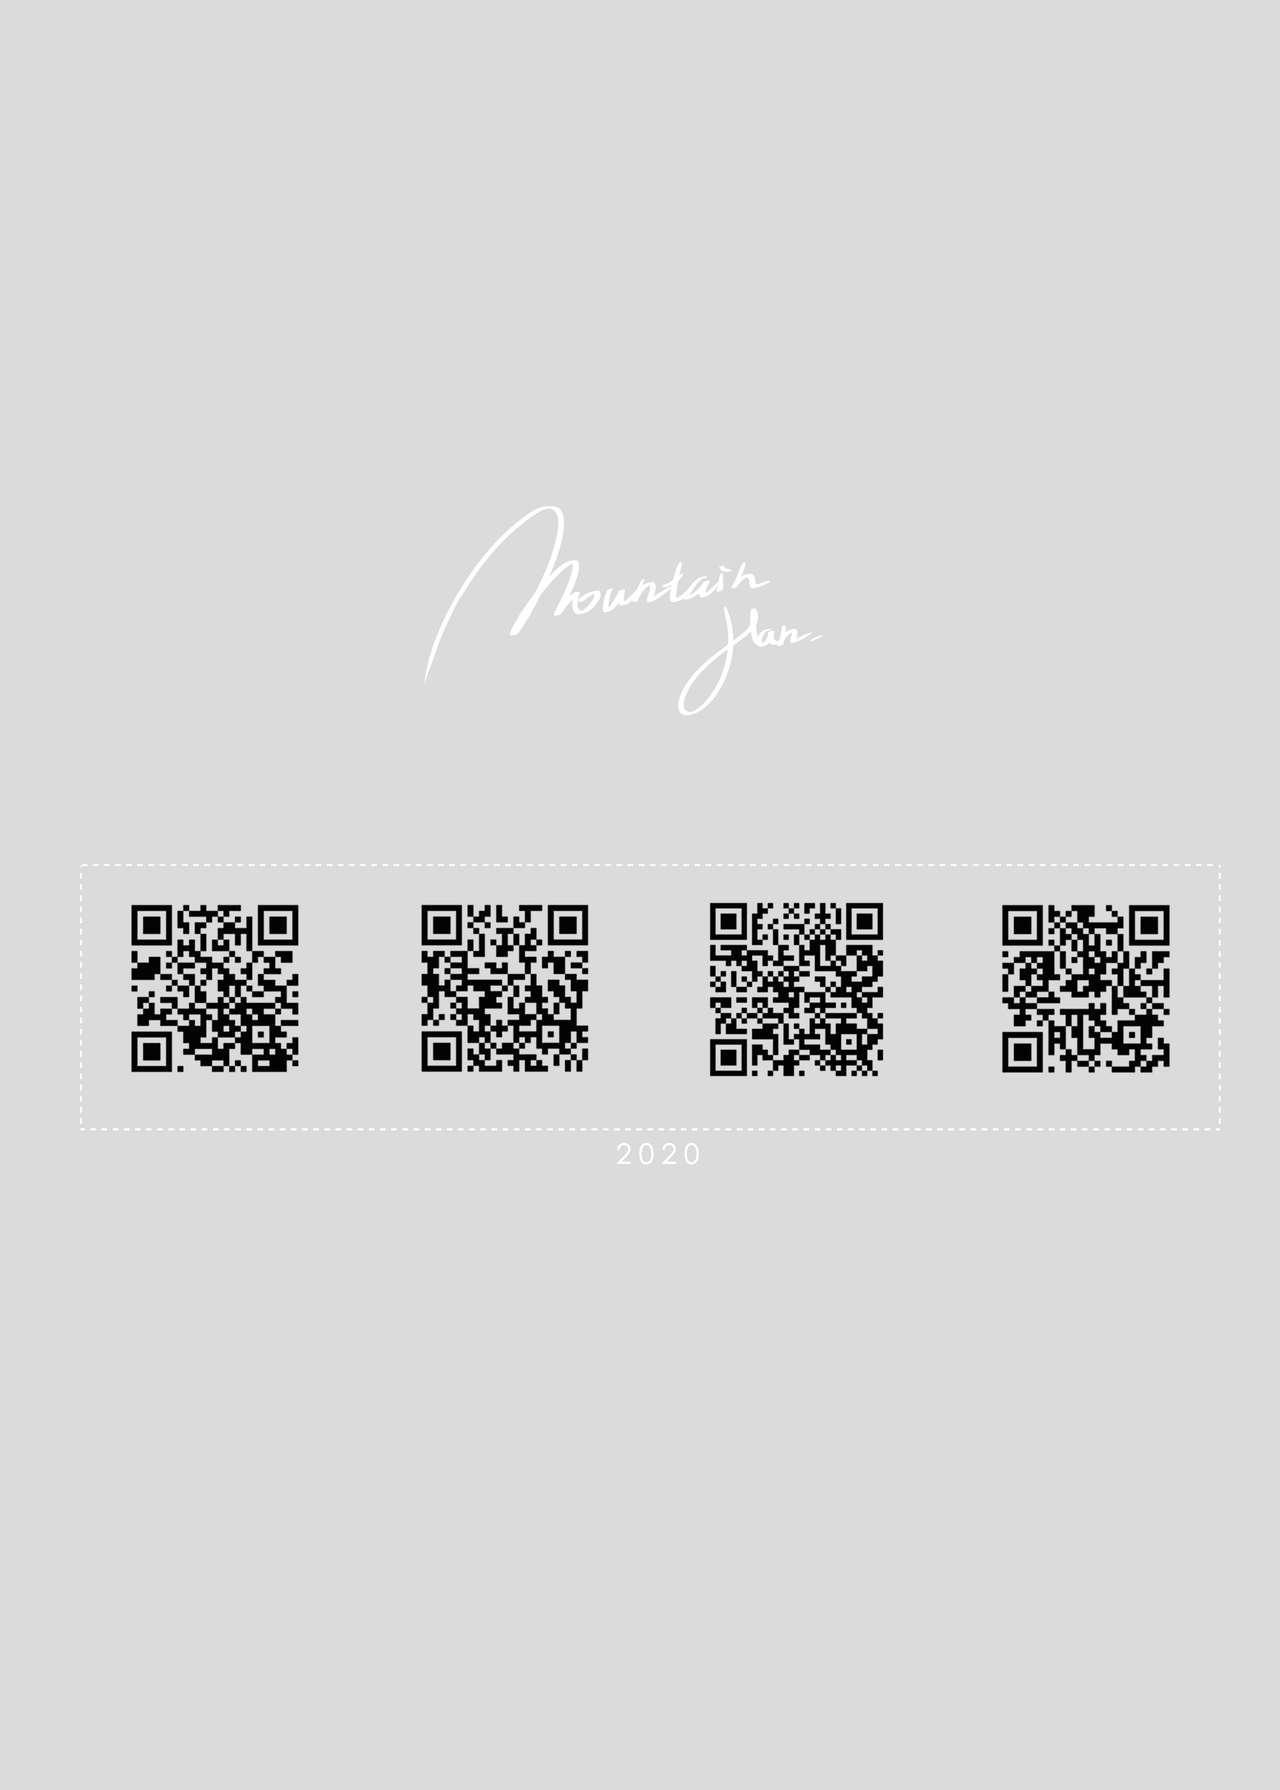 [MountainHan(山含)] Little Lyrical-MiMi 001 (Princess Connect! Re:Dive) [Chinese] [切嚕系女子個人搬運] [Decensored] +小宣傳 2